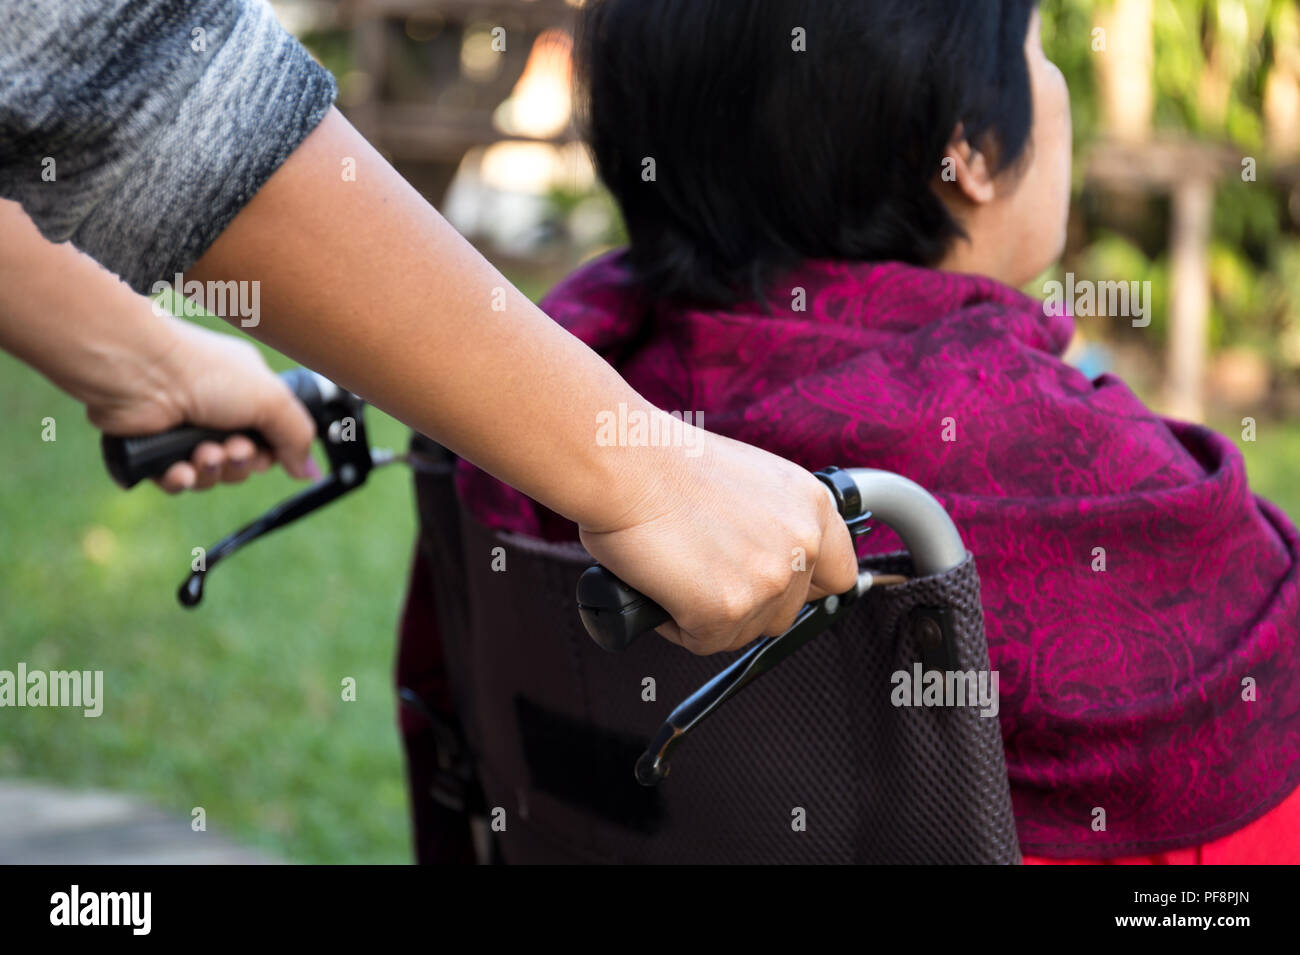 Custode spingendo senior donna in sedia a rotelle Immagini Stock